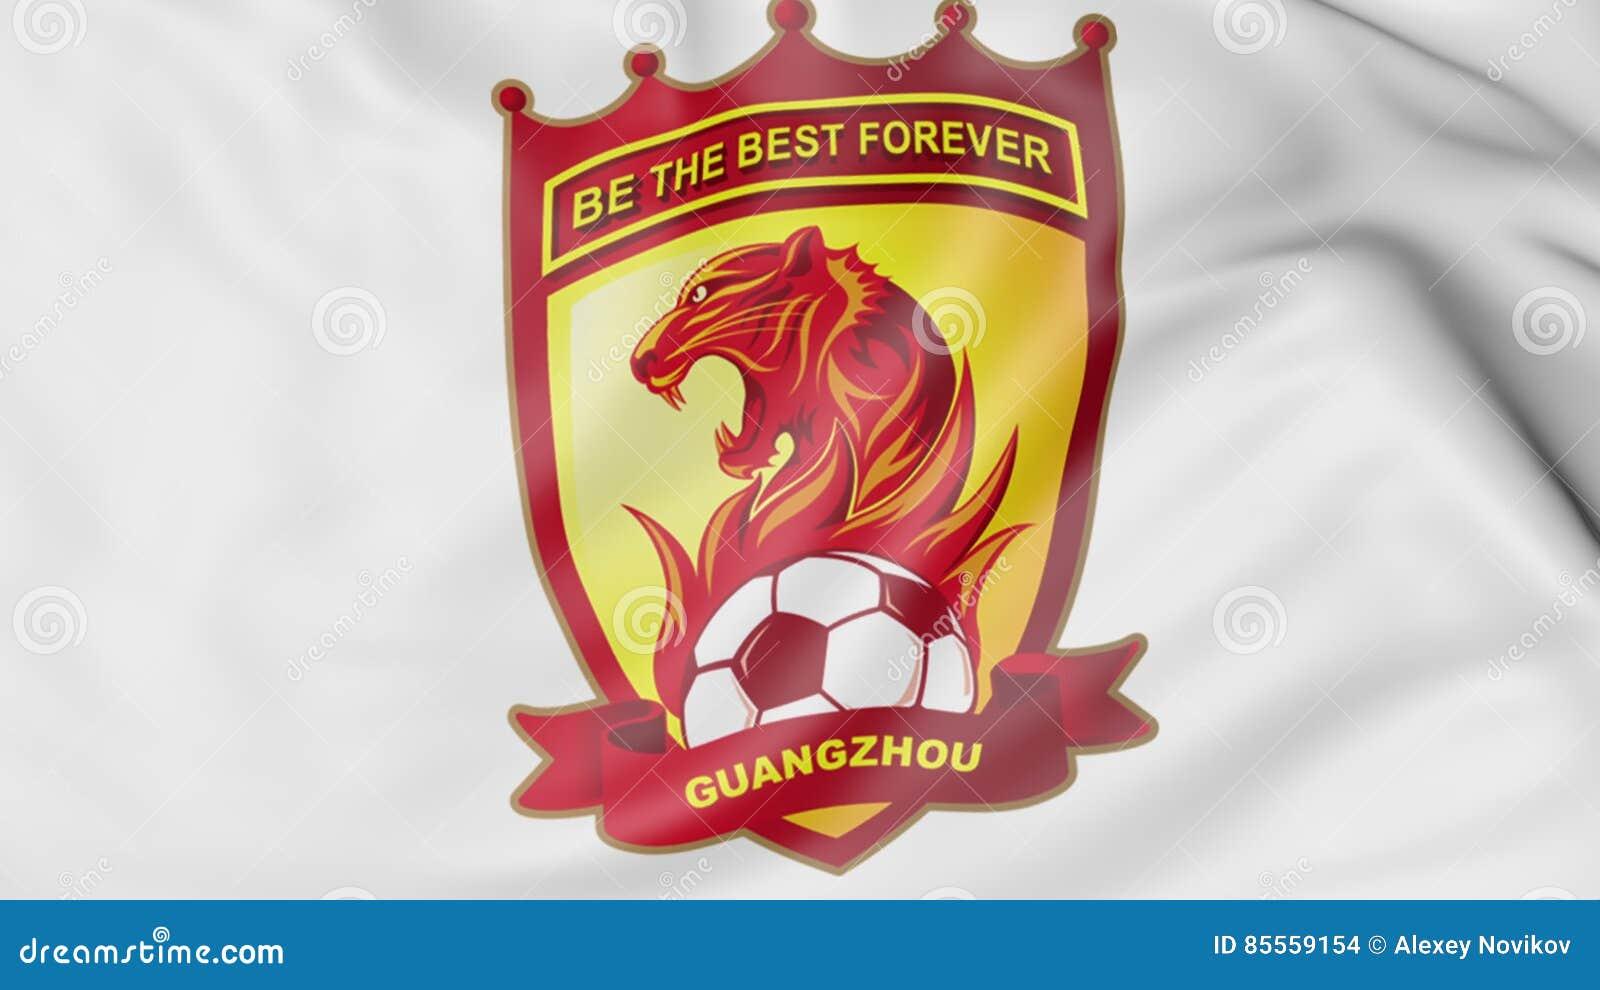 Close Up Of Waving Flag With Guangzhou Evergrande Taobao Fc Football